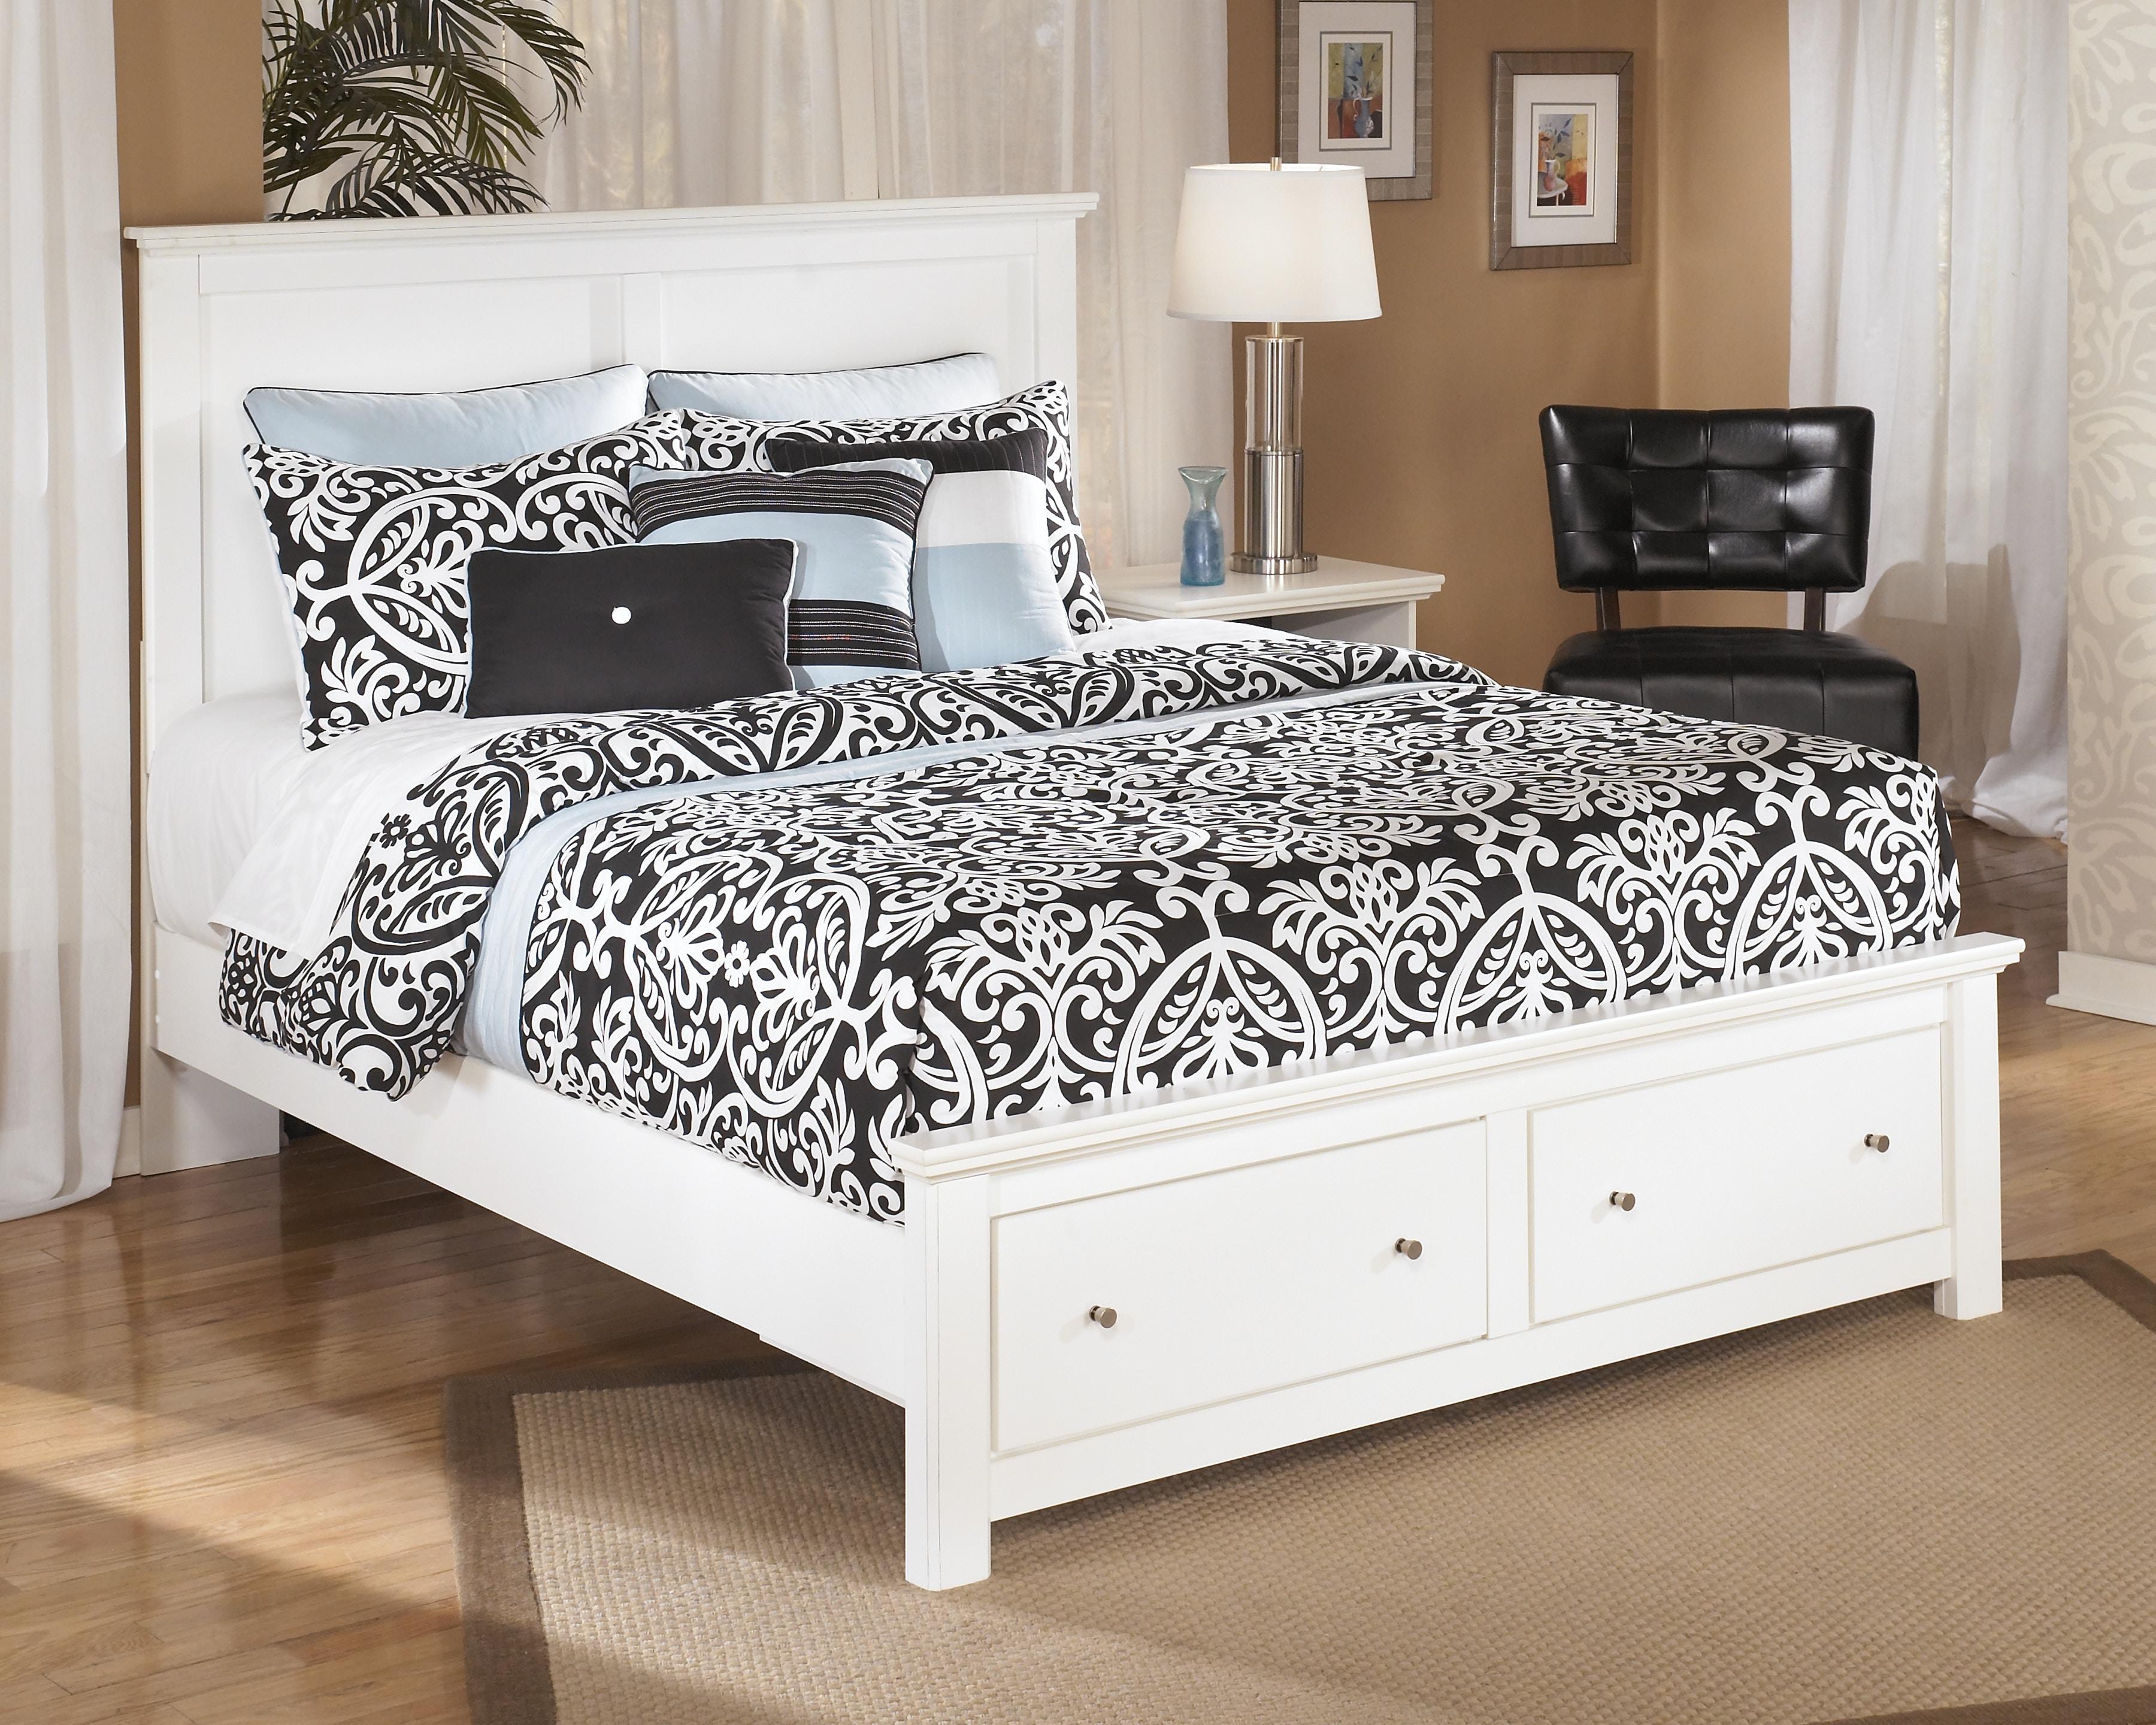 Signature Design By Ashley Bedroom Q Platform Storage